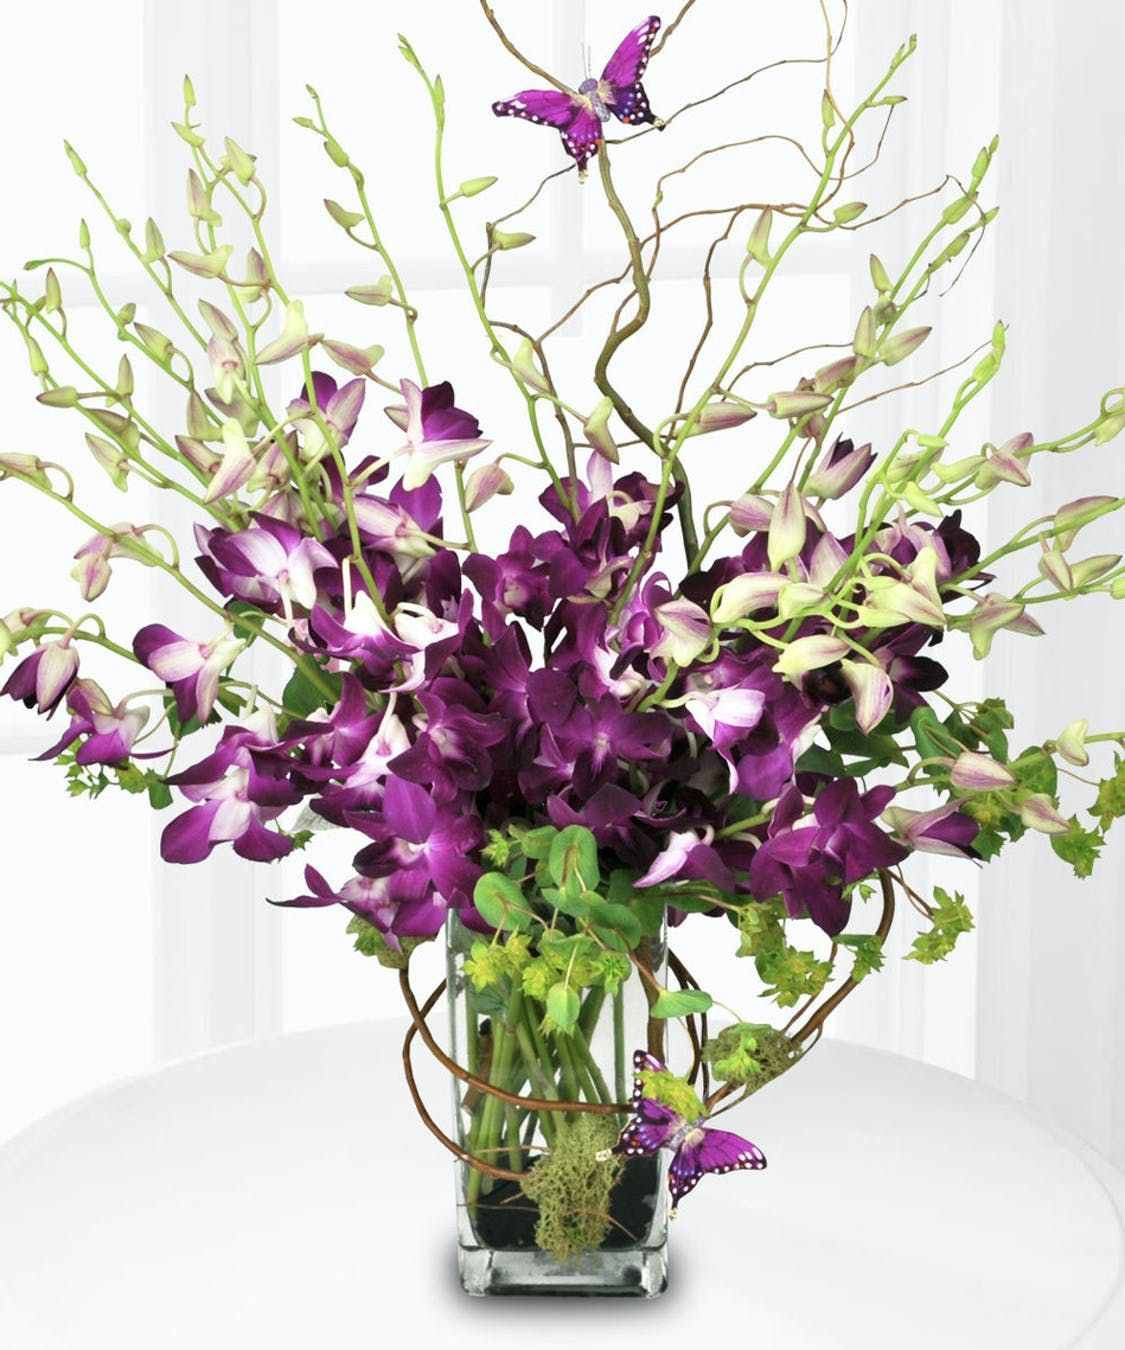 Tropical Twist In 2020 Orchid Flower Arrangements Purple Orchids Amazing Flowers